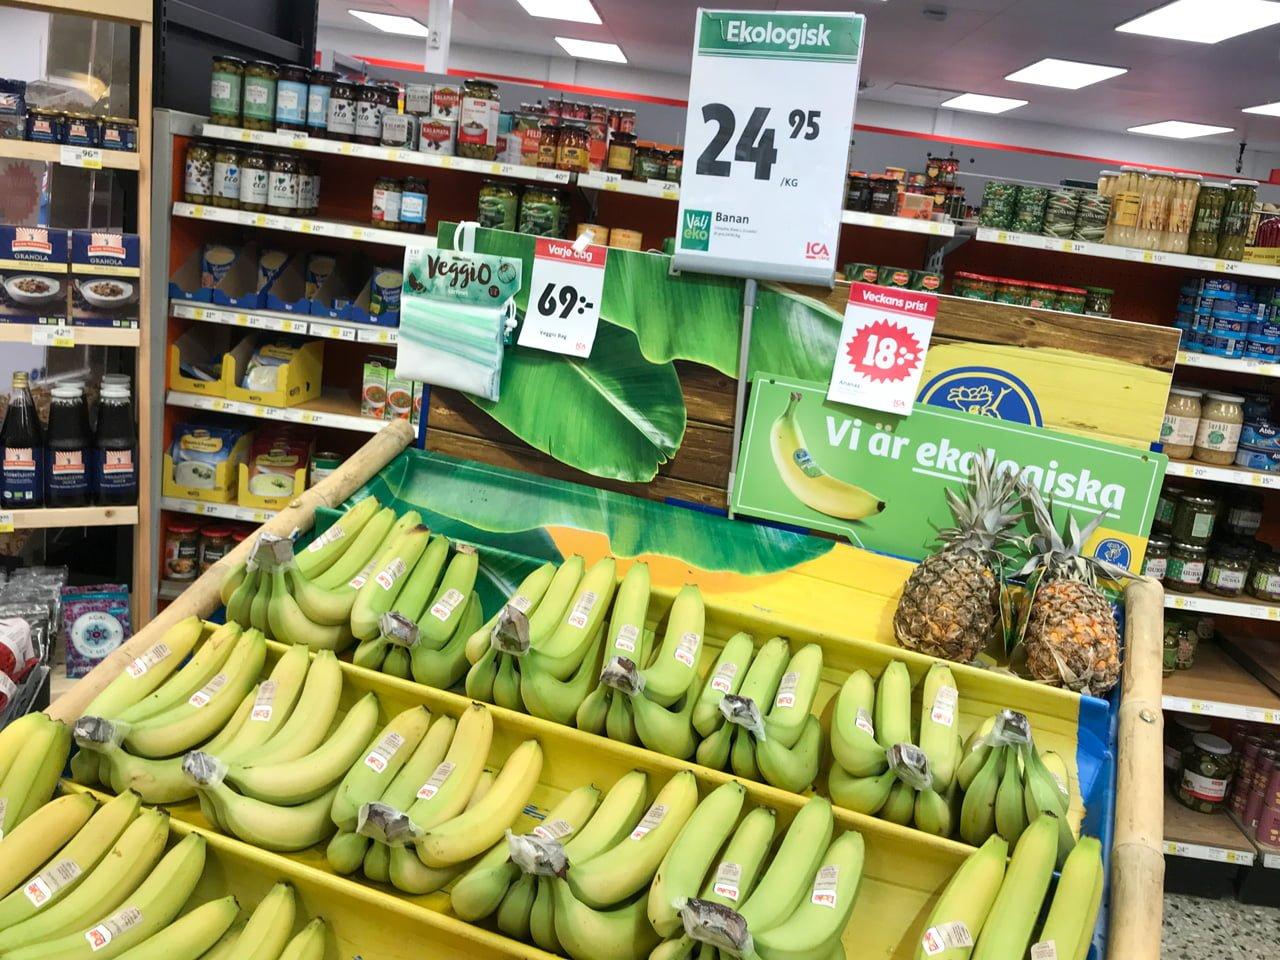 ekologiska bananer